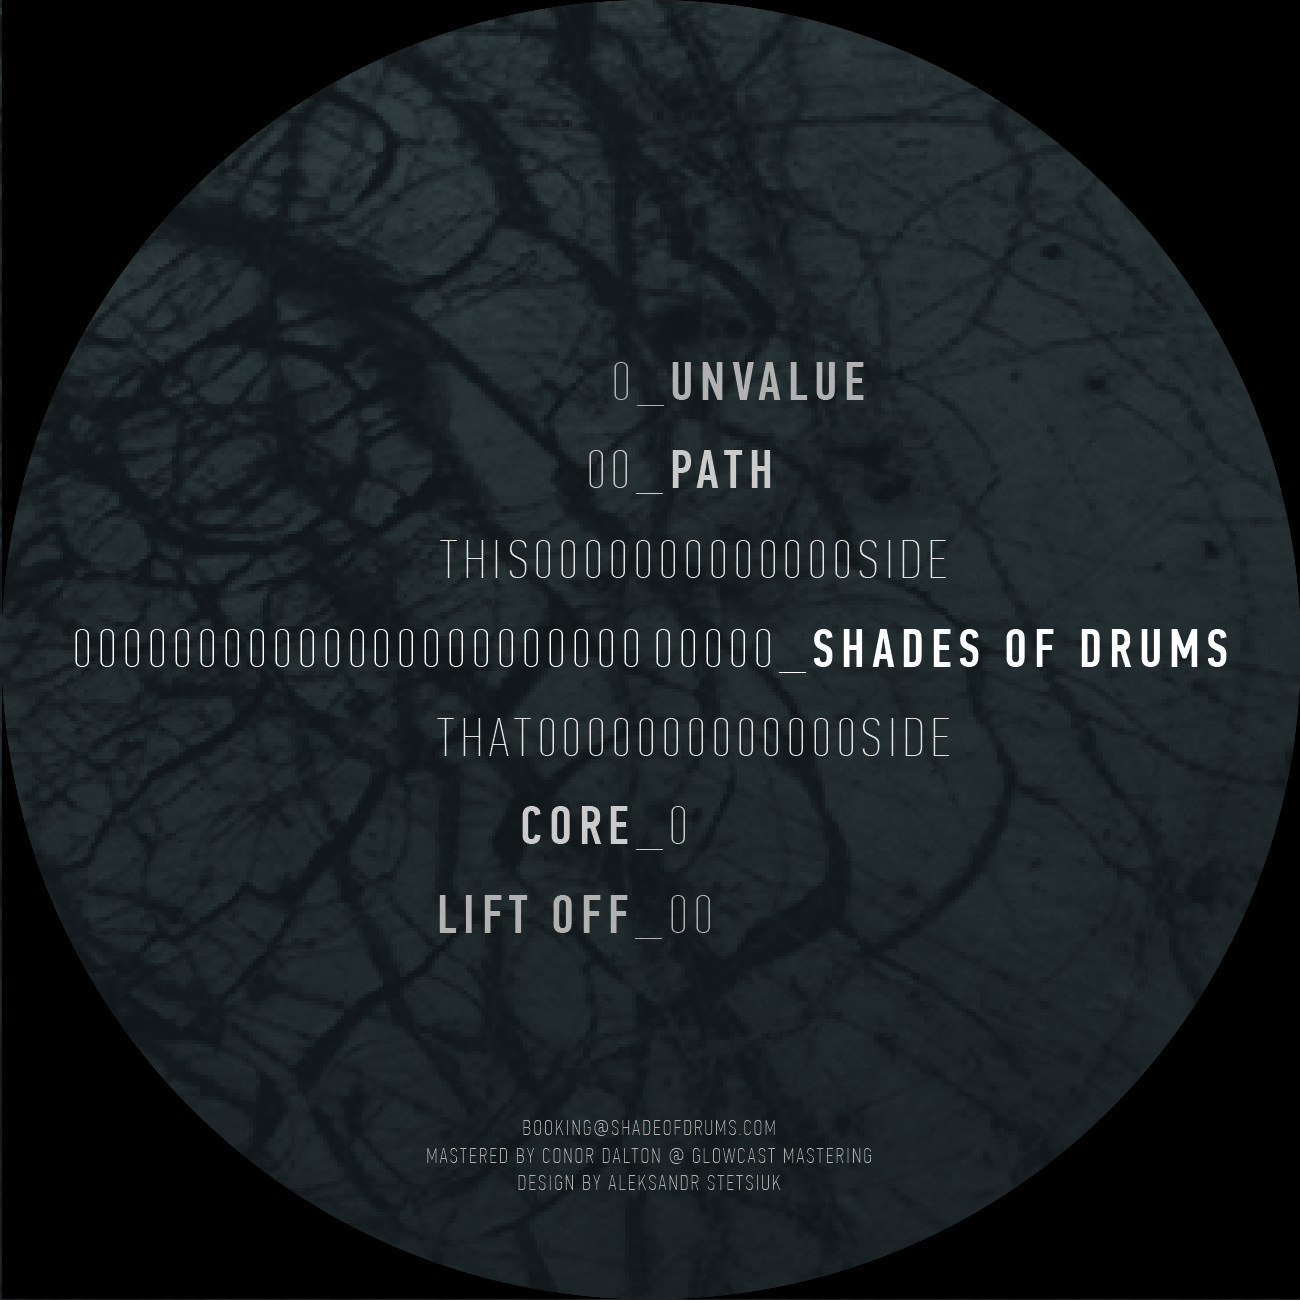 shade_of_drums_-_cnep02_label.jpg